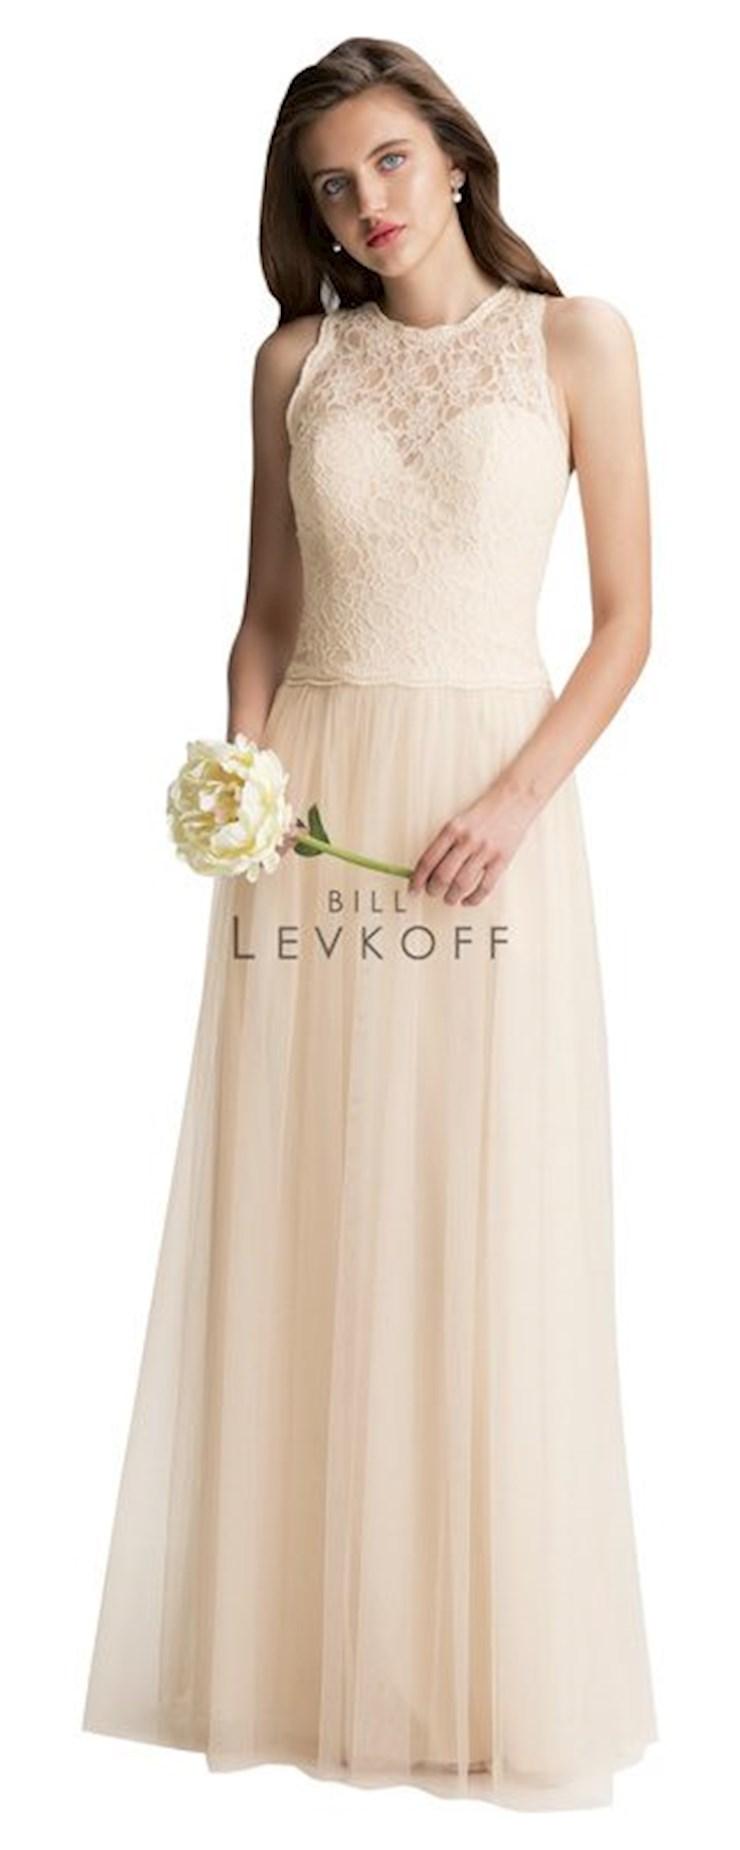 Bill Levkoff Style 1424